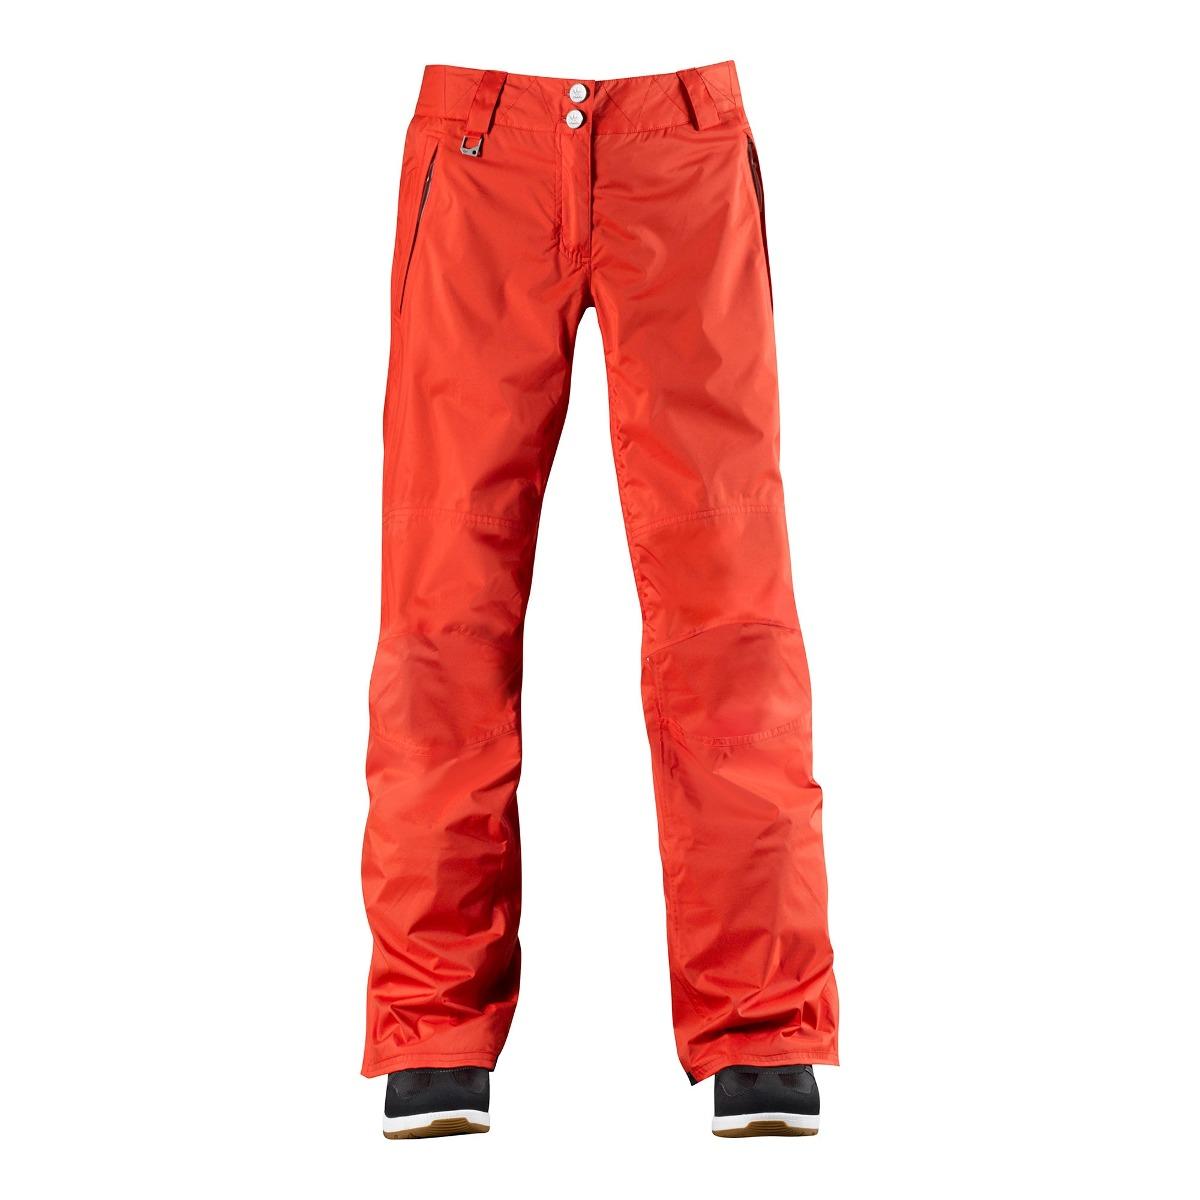 ab3b5979d03f8 pantalon adidas para snowboard de mujer talla m impermeable. Cargando zoom.